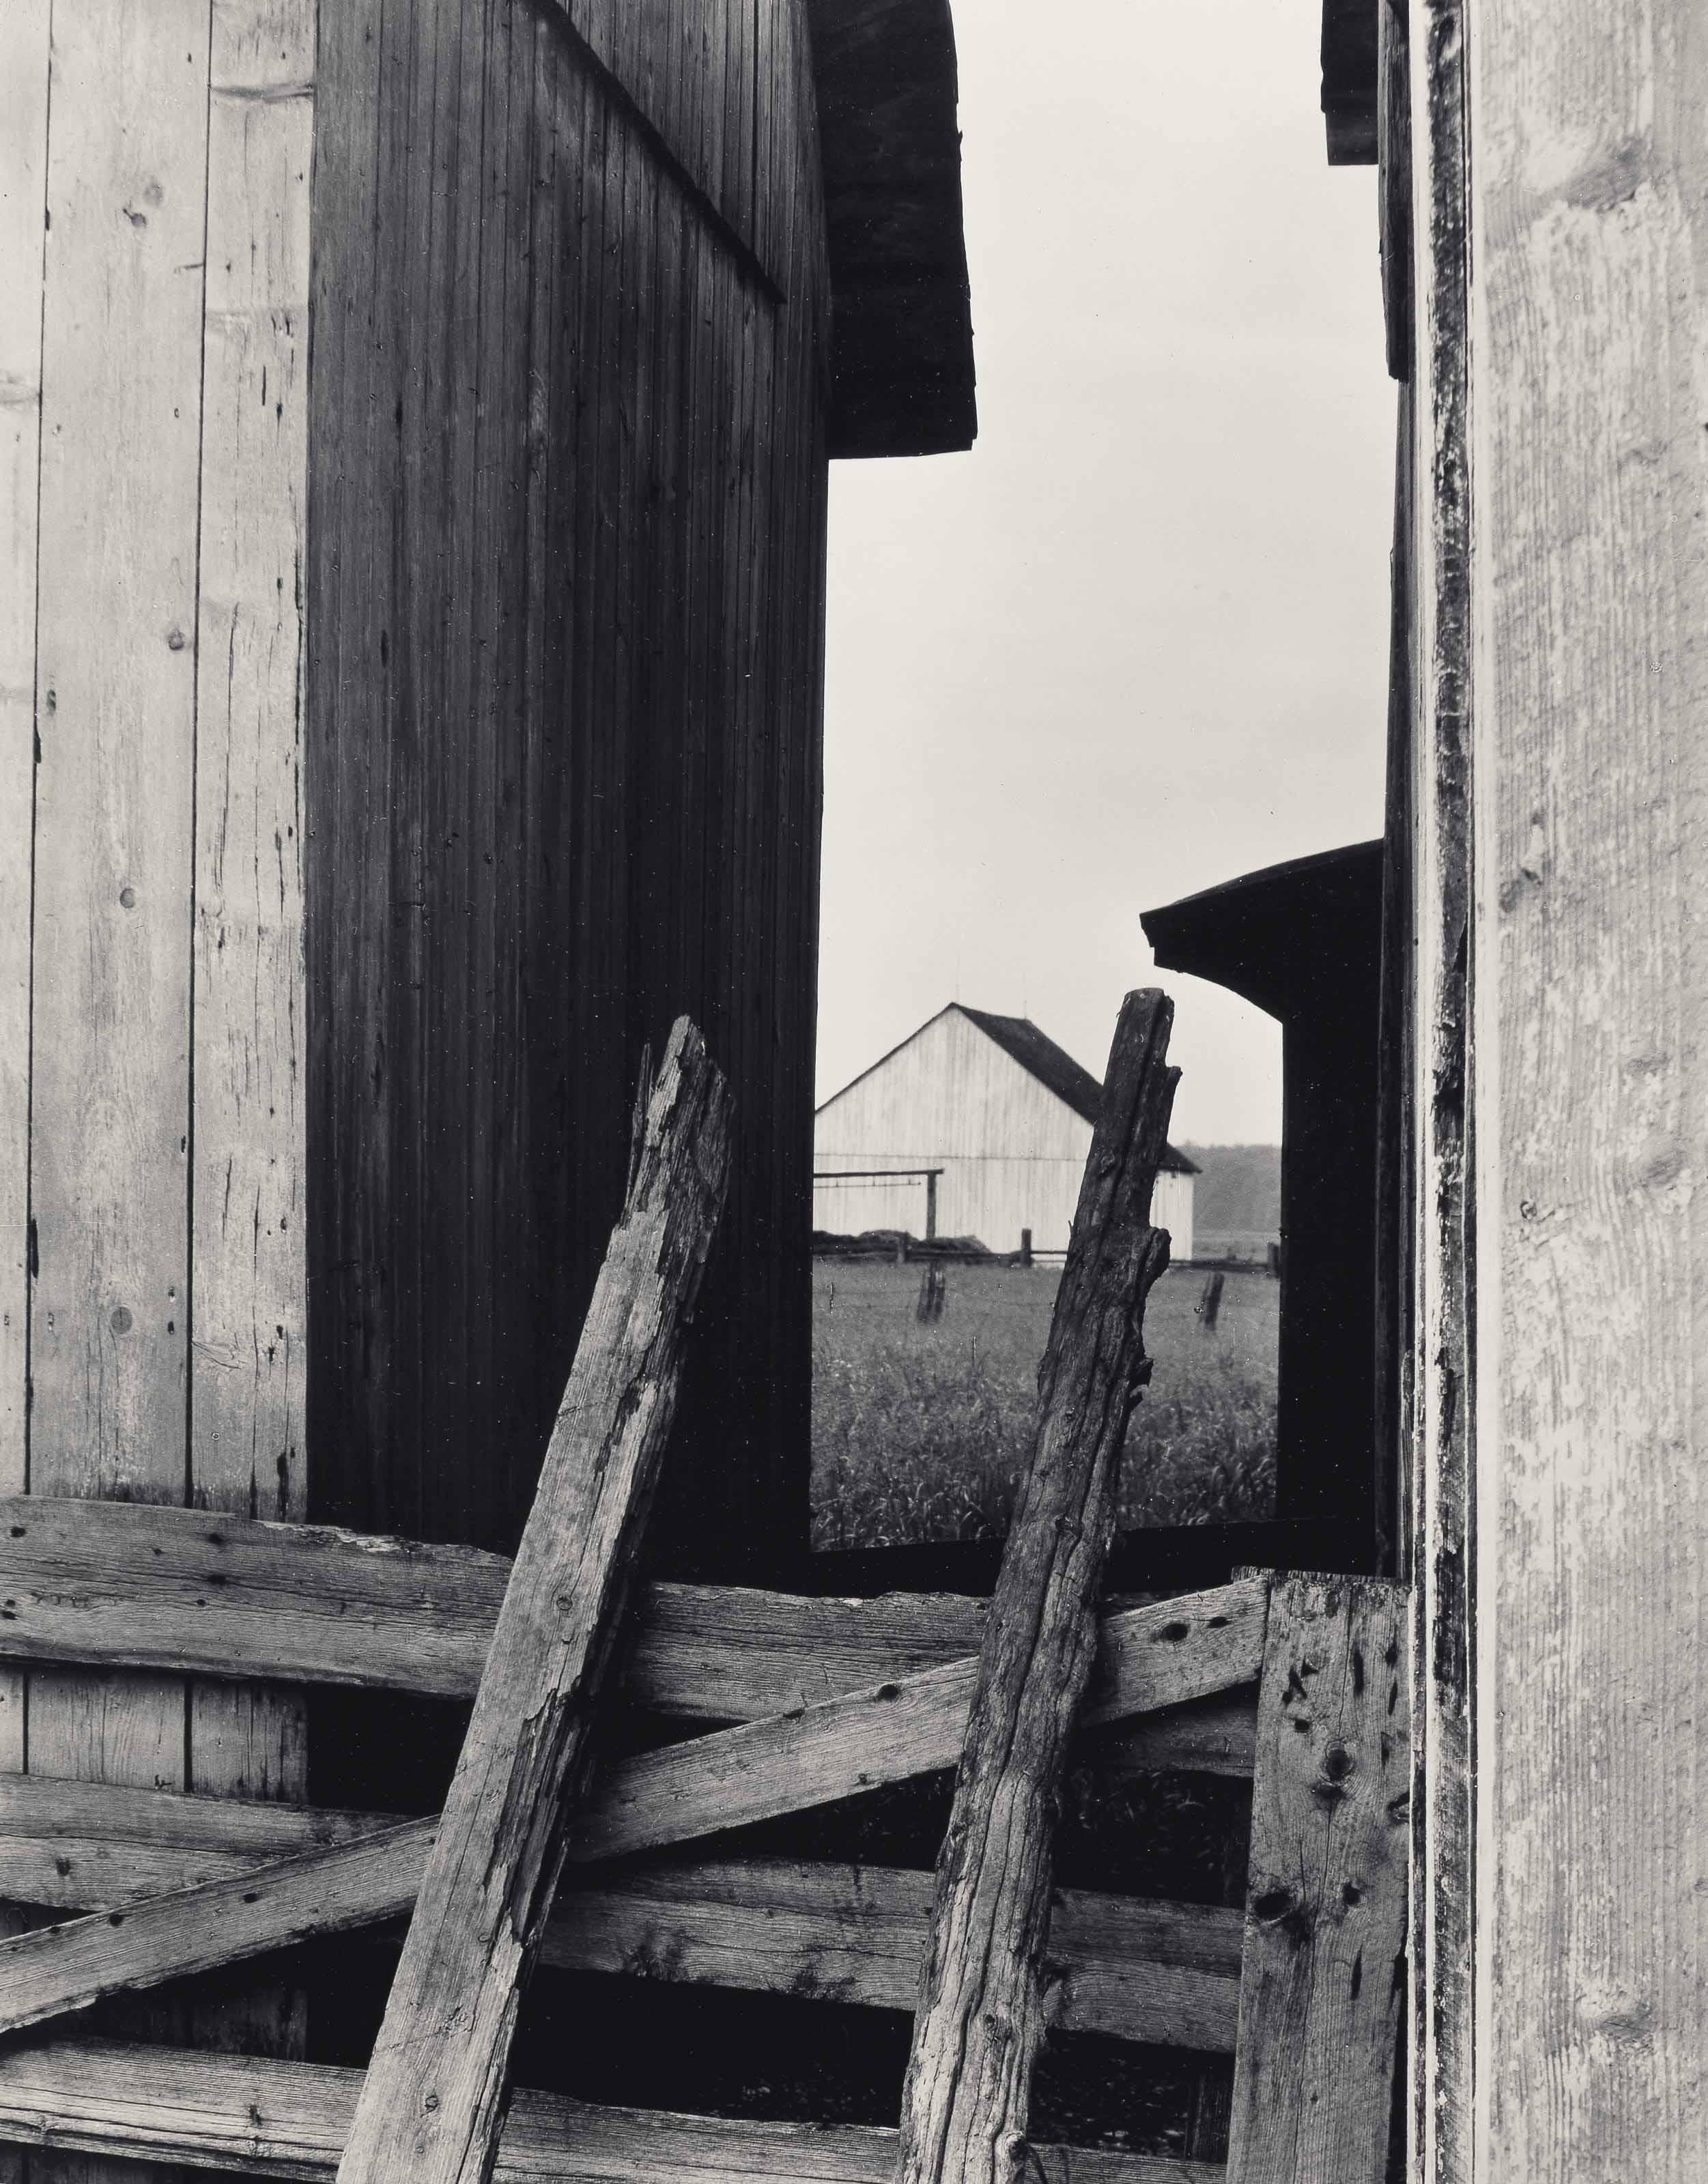 The Barn, Quebec, 1936